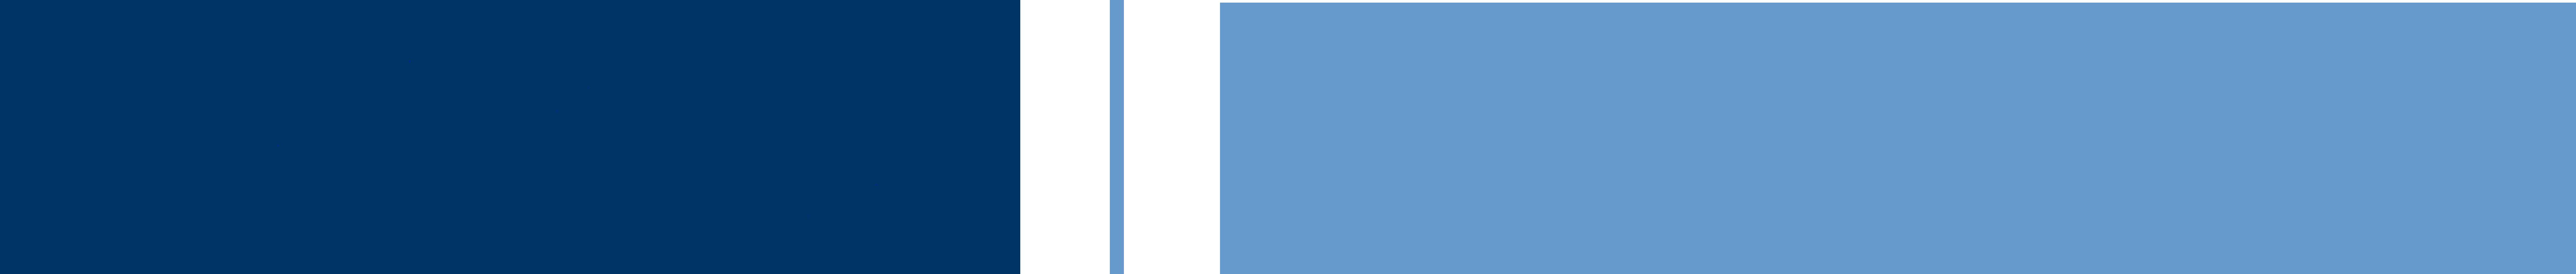 LYNX-OS-178_New_Logo_Draft_03c